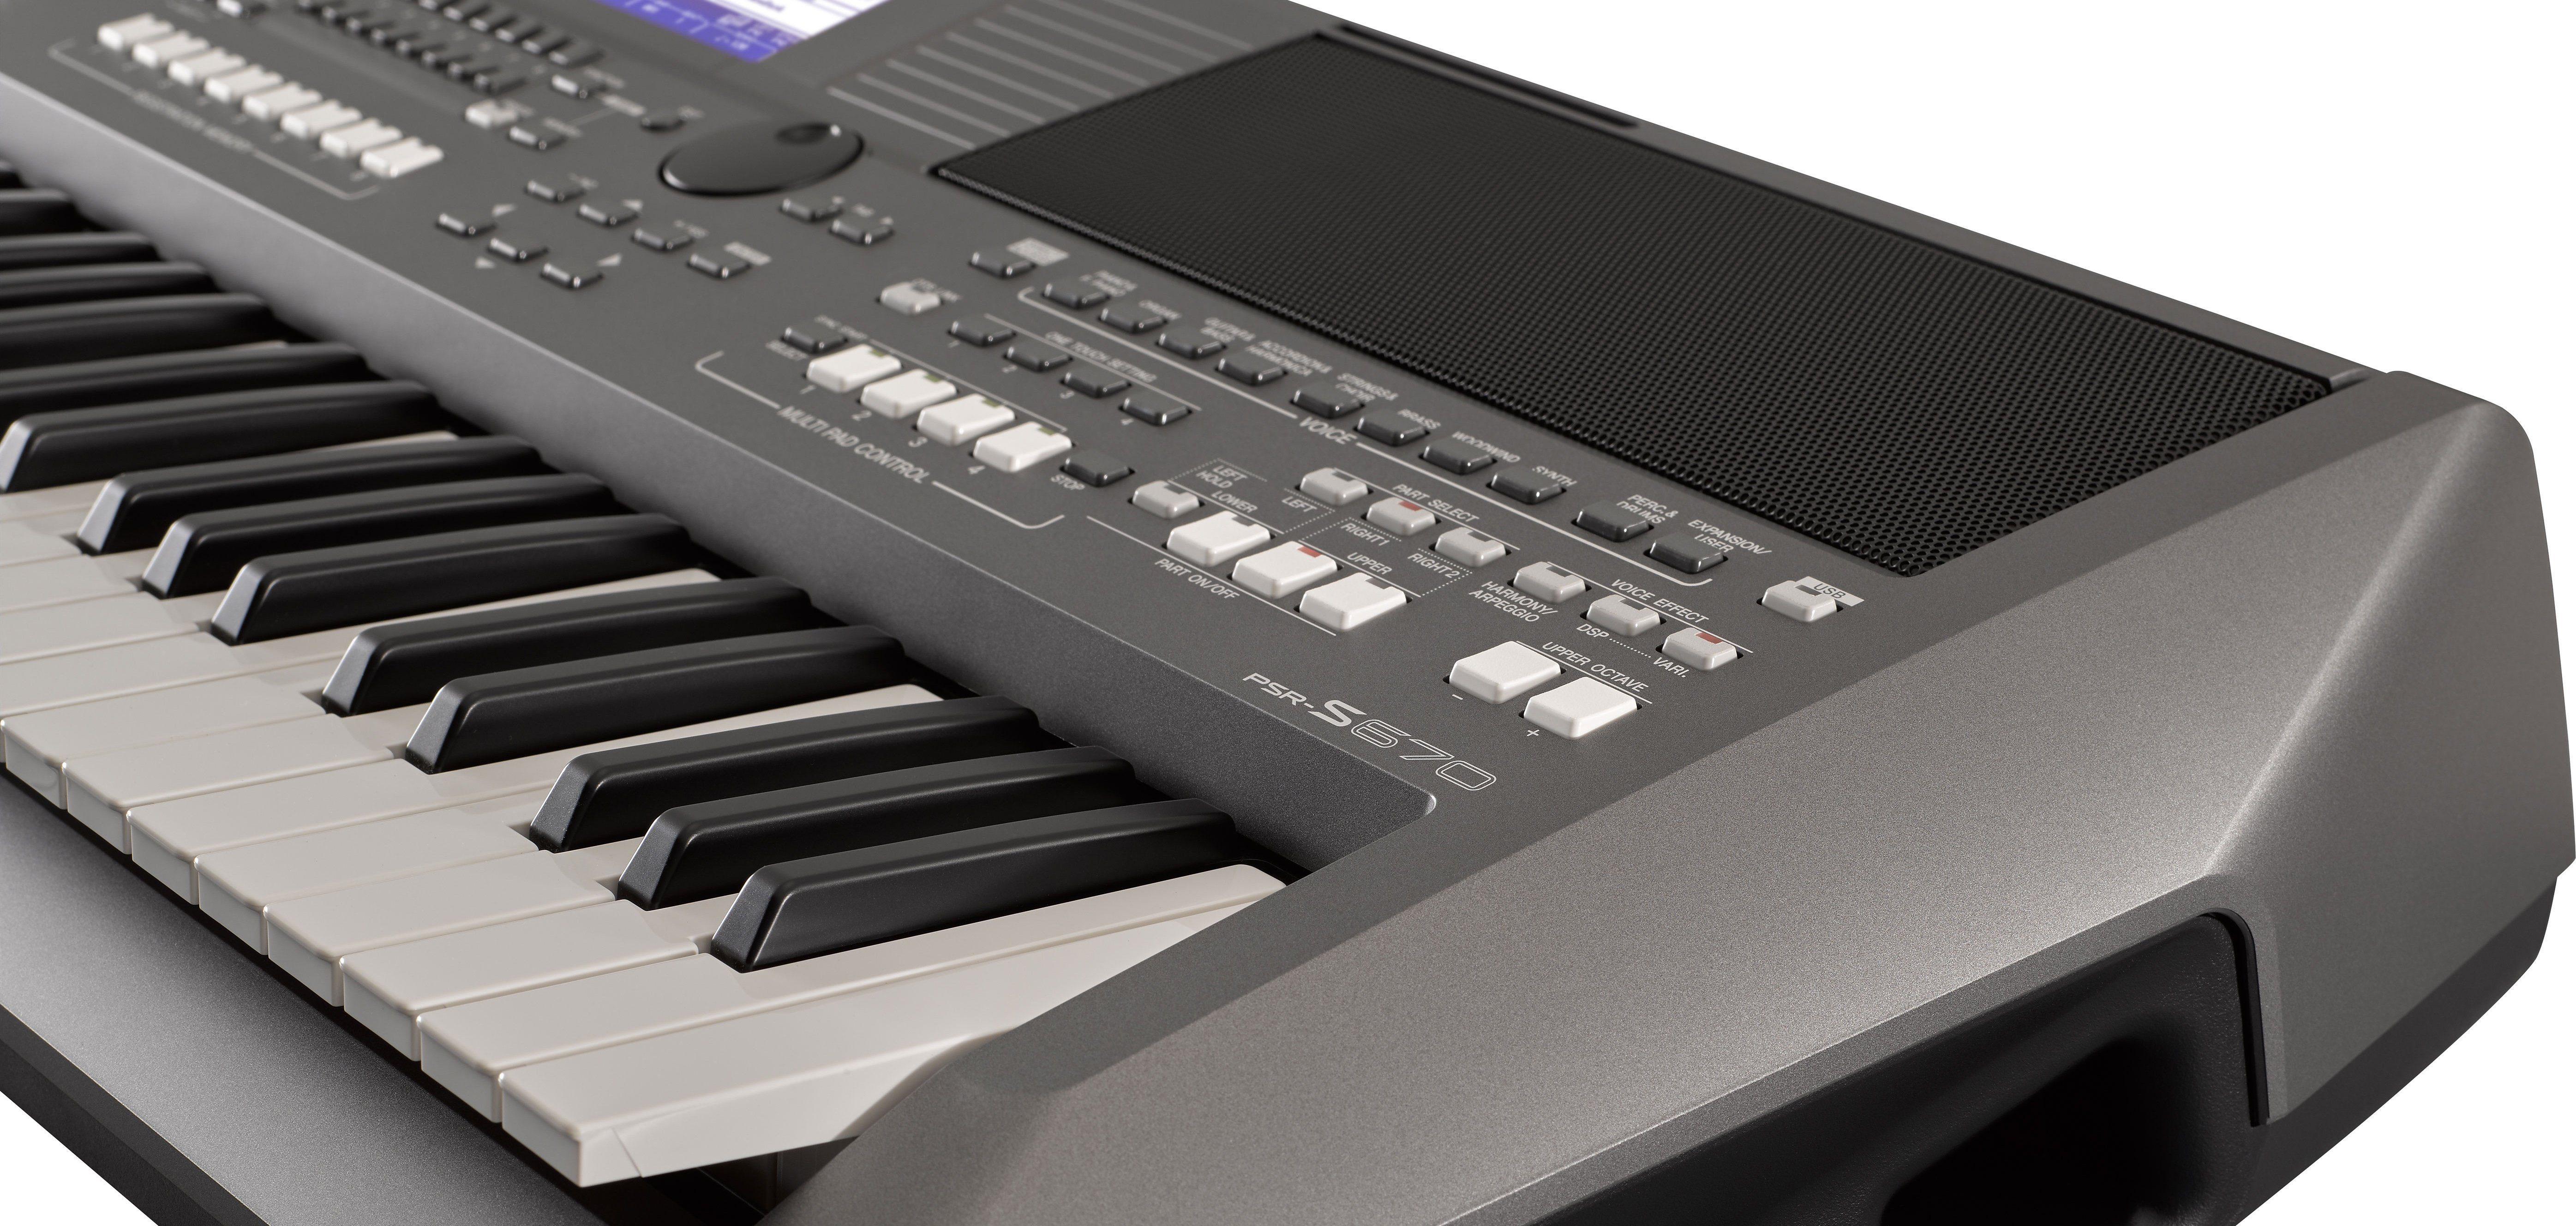 test yamaha psr s670 entertainer keyboard seite 5 von. Black Bedroom Furniture Sets. Home Design Ideas